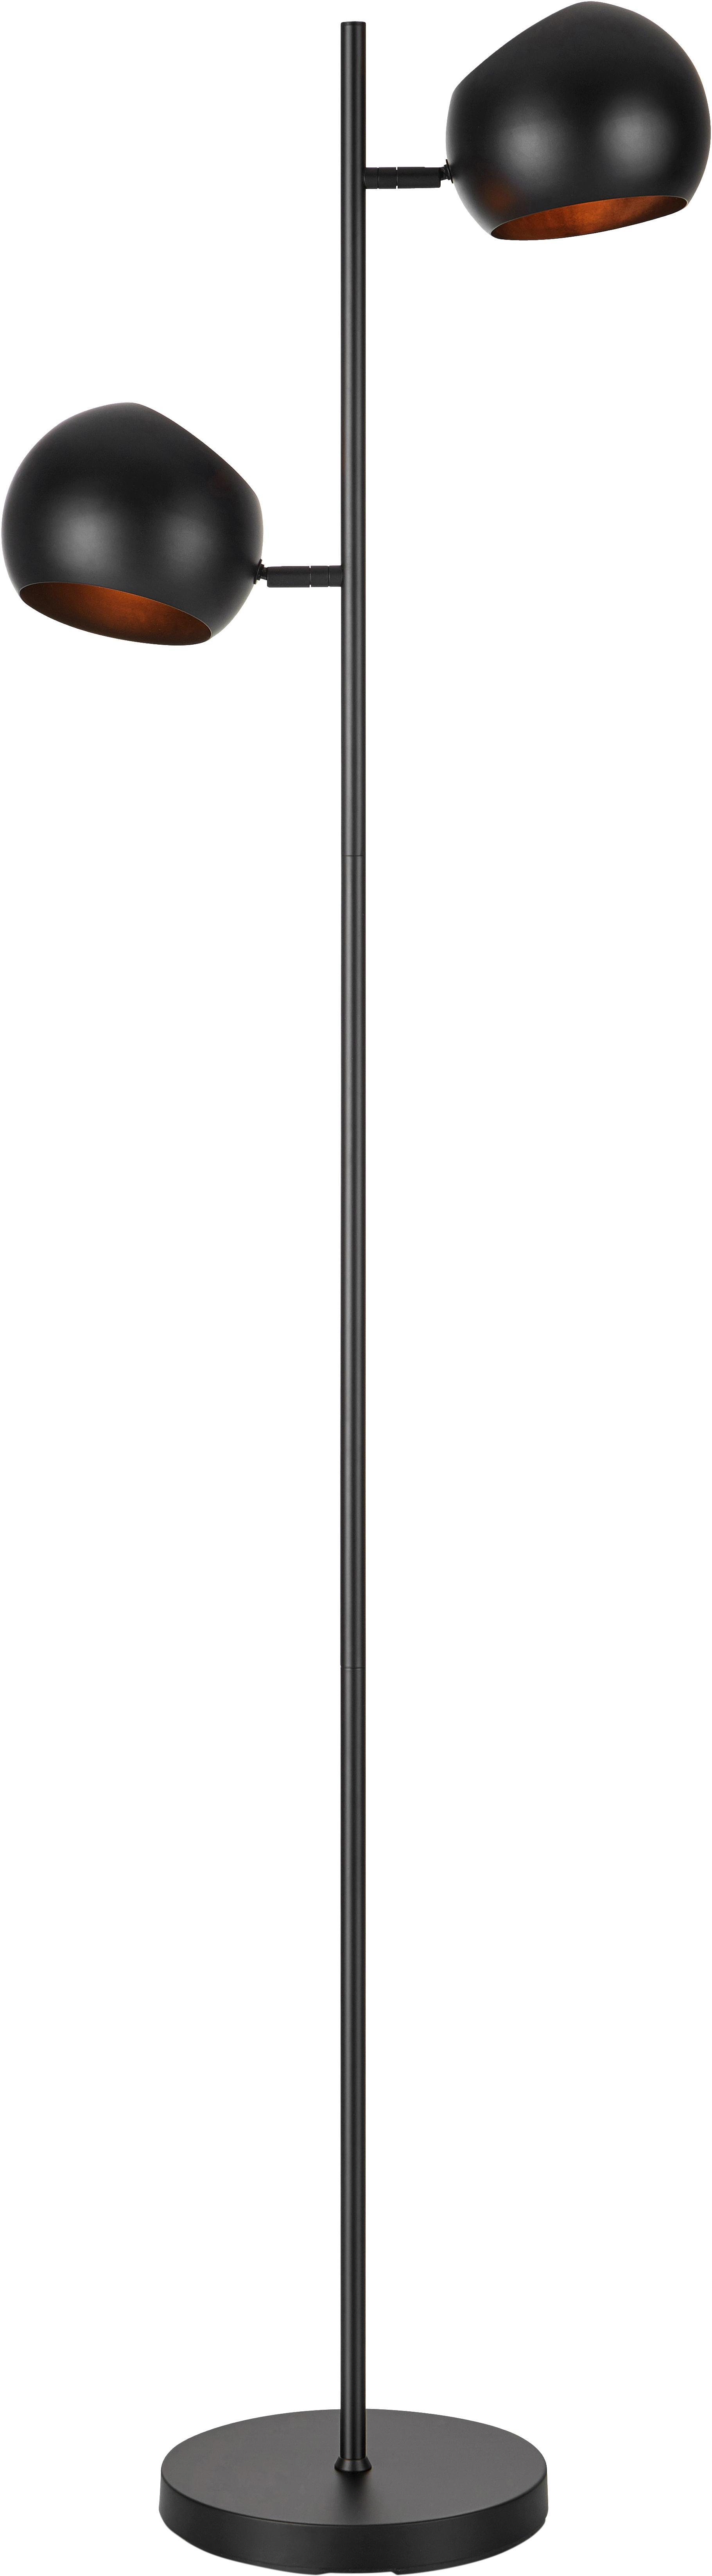 Lampada da terra Edgar, Nero, Larg. 40 x Alt. 145 cm